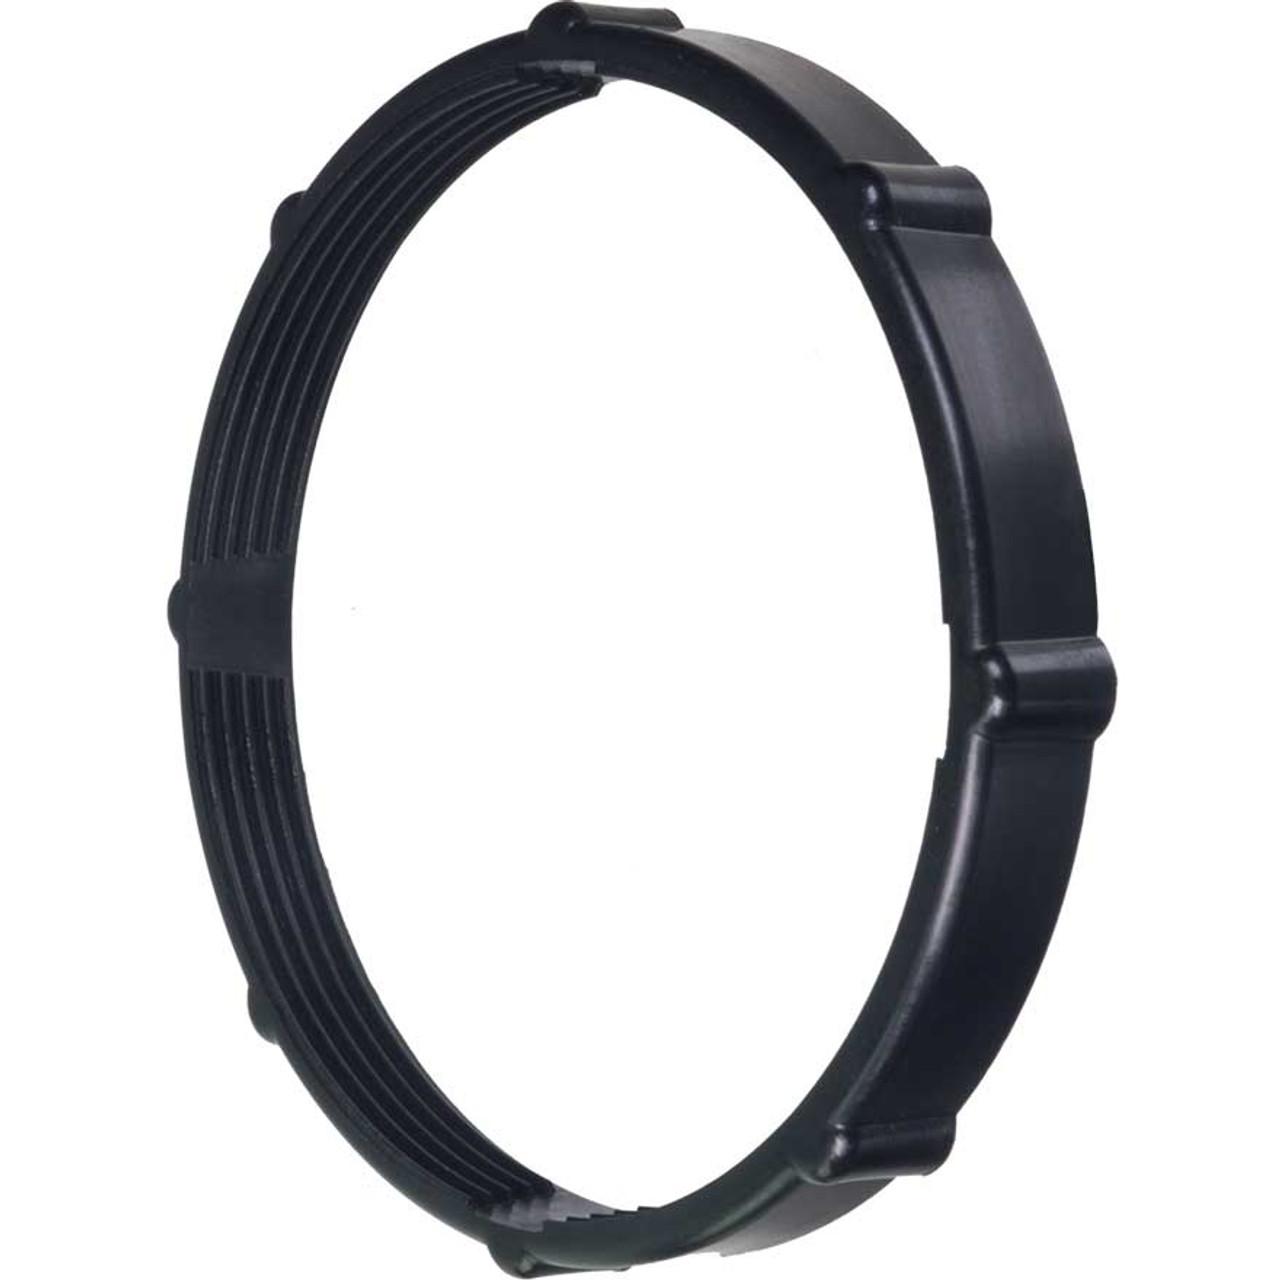 "Spin Lock Ring for 4"" Gauges"